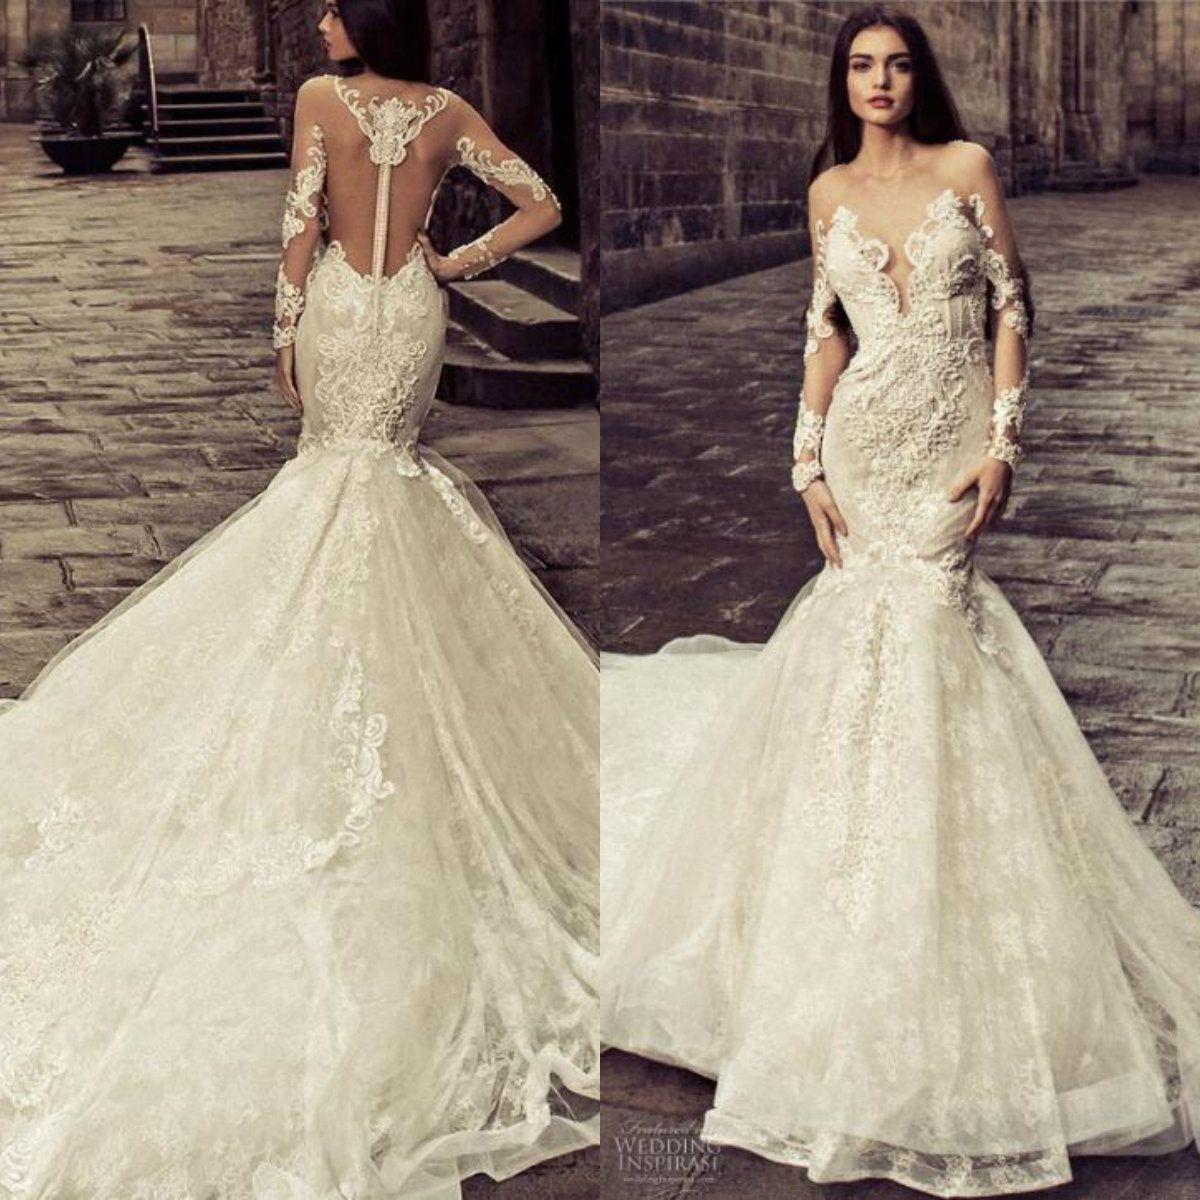 288b5572014e Julia Kontogruni 2018 Wedding Dress With Long Sleeves Sheer Neck Appliques  Beaded Bridal Gowns Sweep Train Mermaid Wedding Dresses Cheap Lace Mermaid  ...